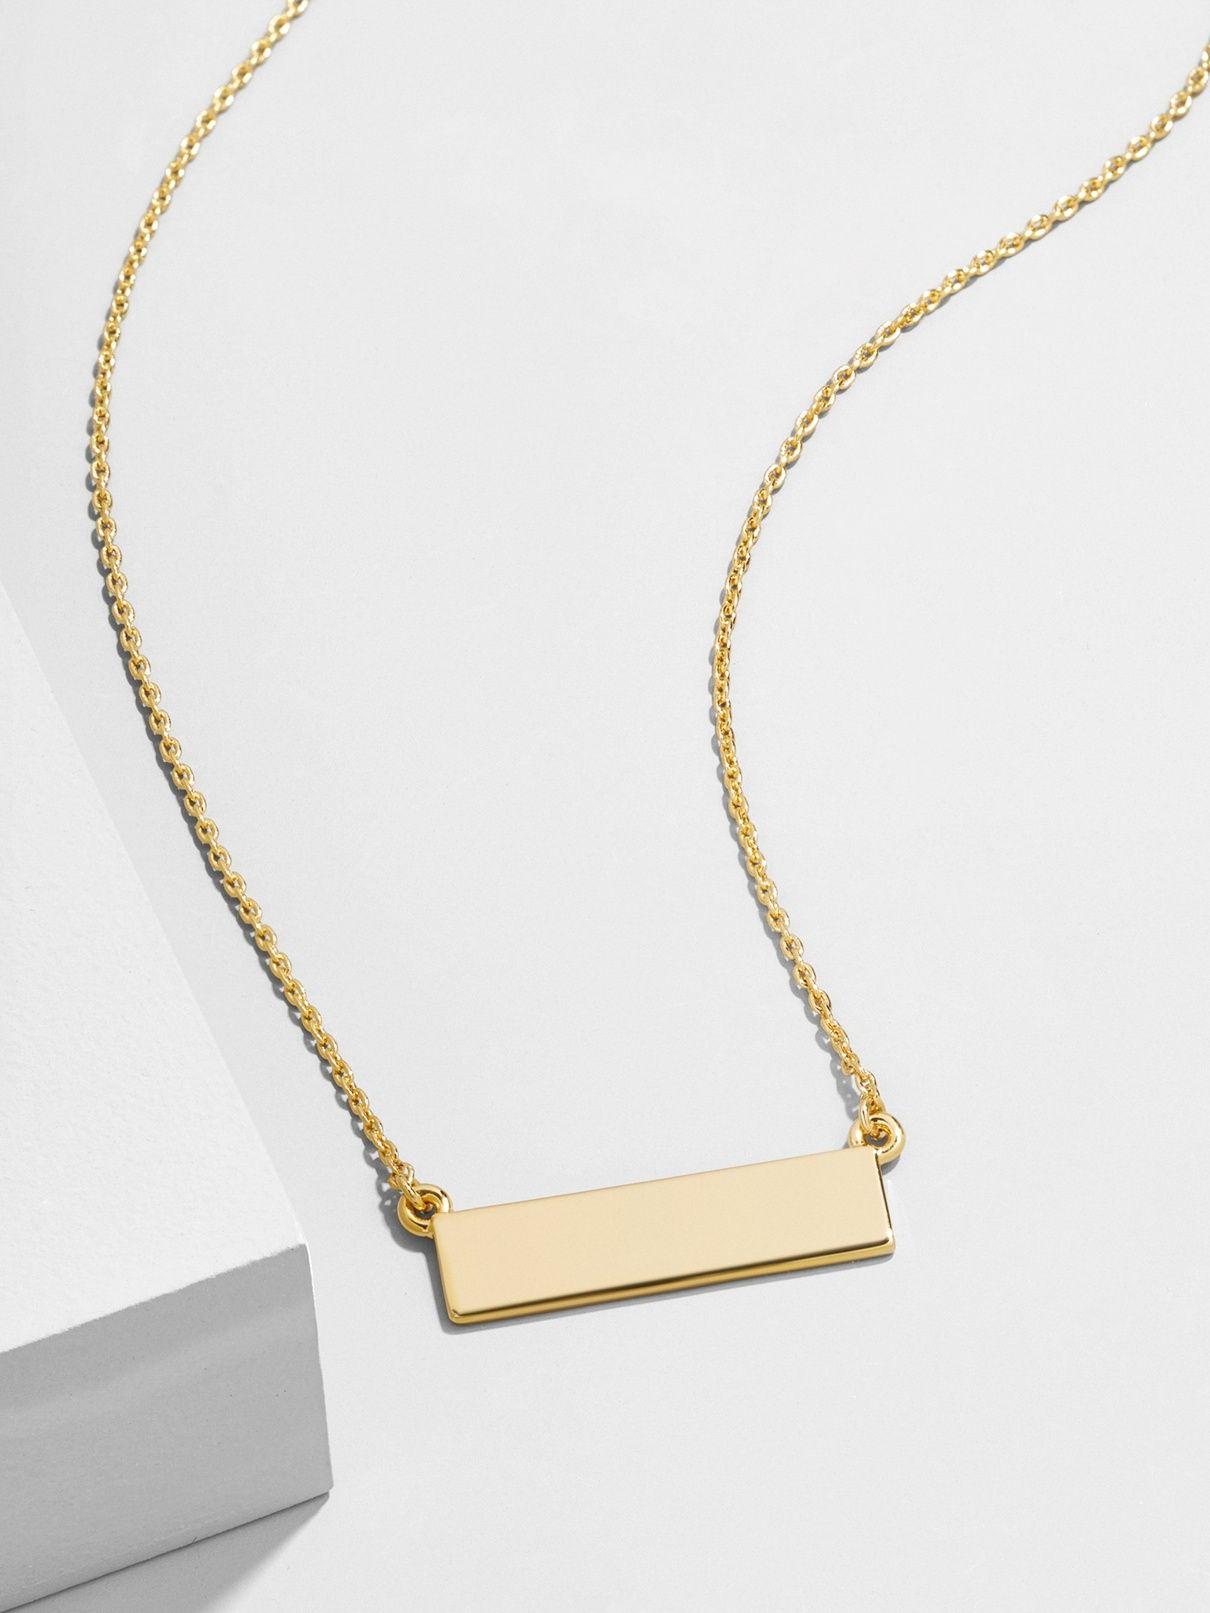 29be96ef4e6c Allorah Pendant Necklace